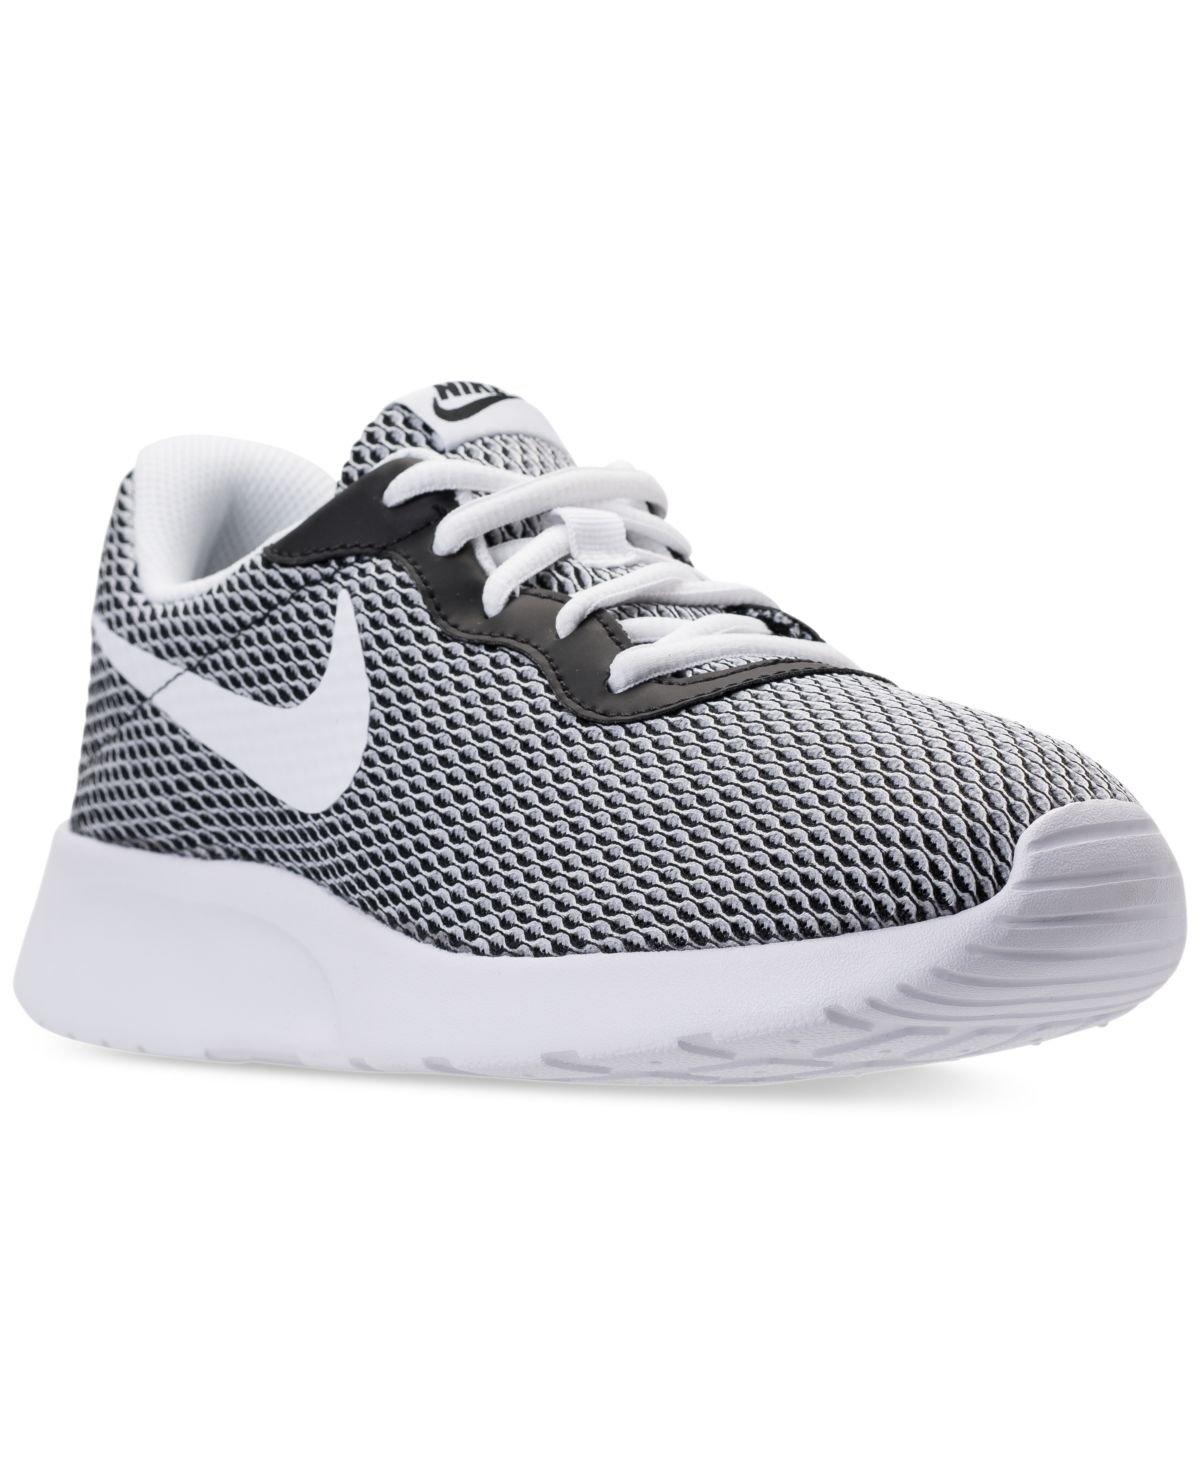 NIKE Men's Tanjun SE Sneaker B01K6OQYRC 7.5 D(M) US Black, White